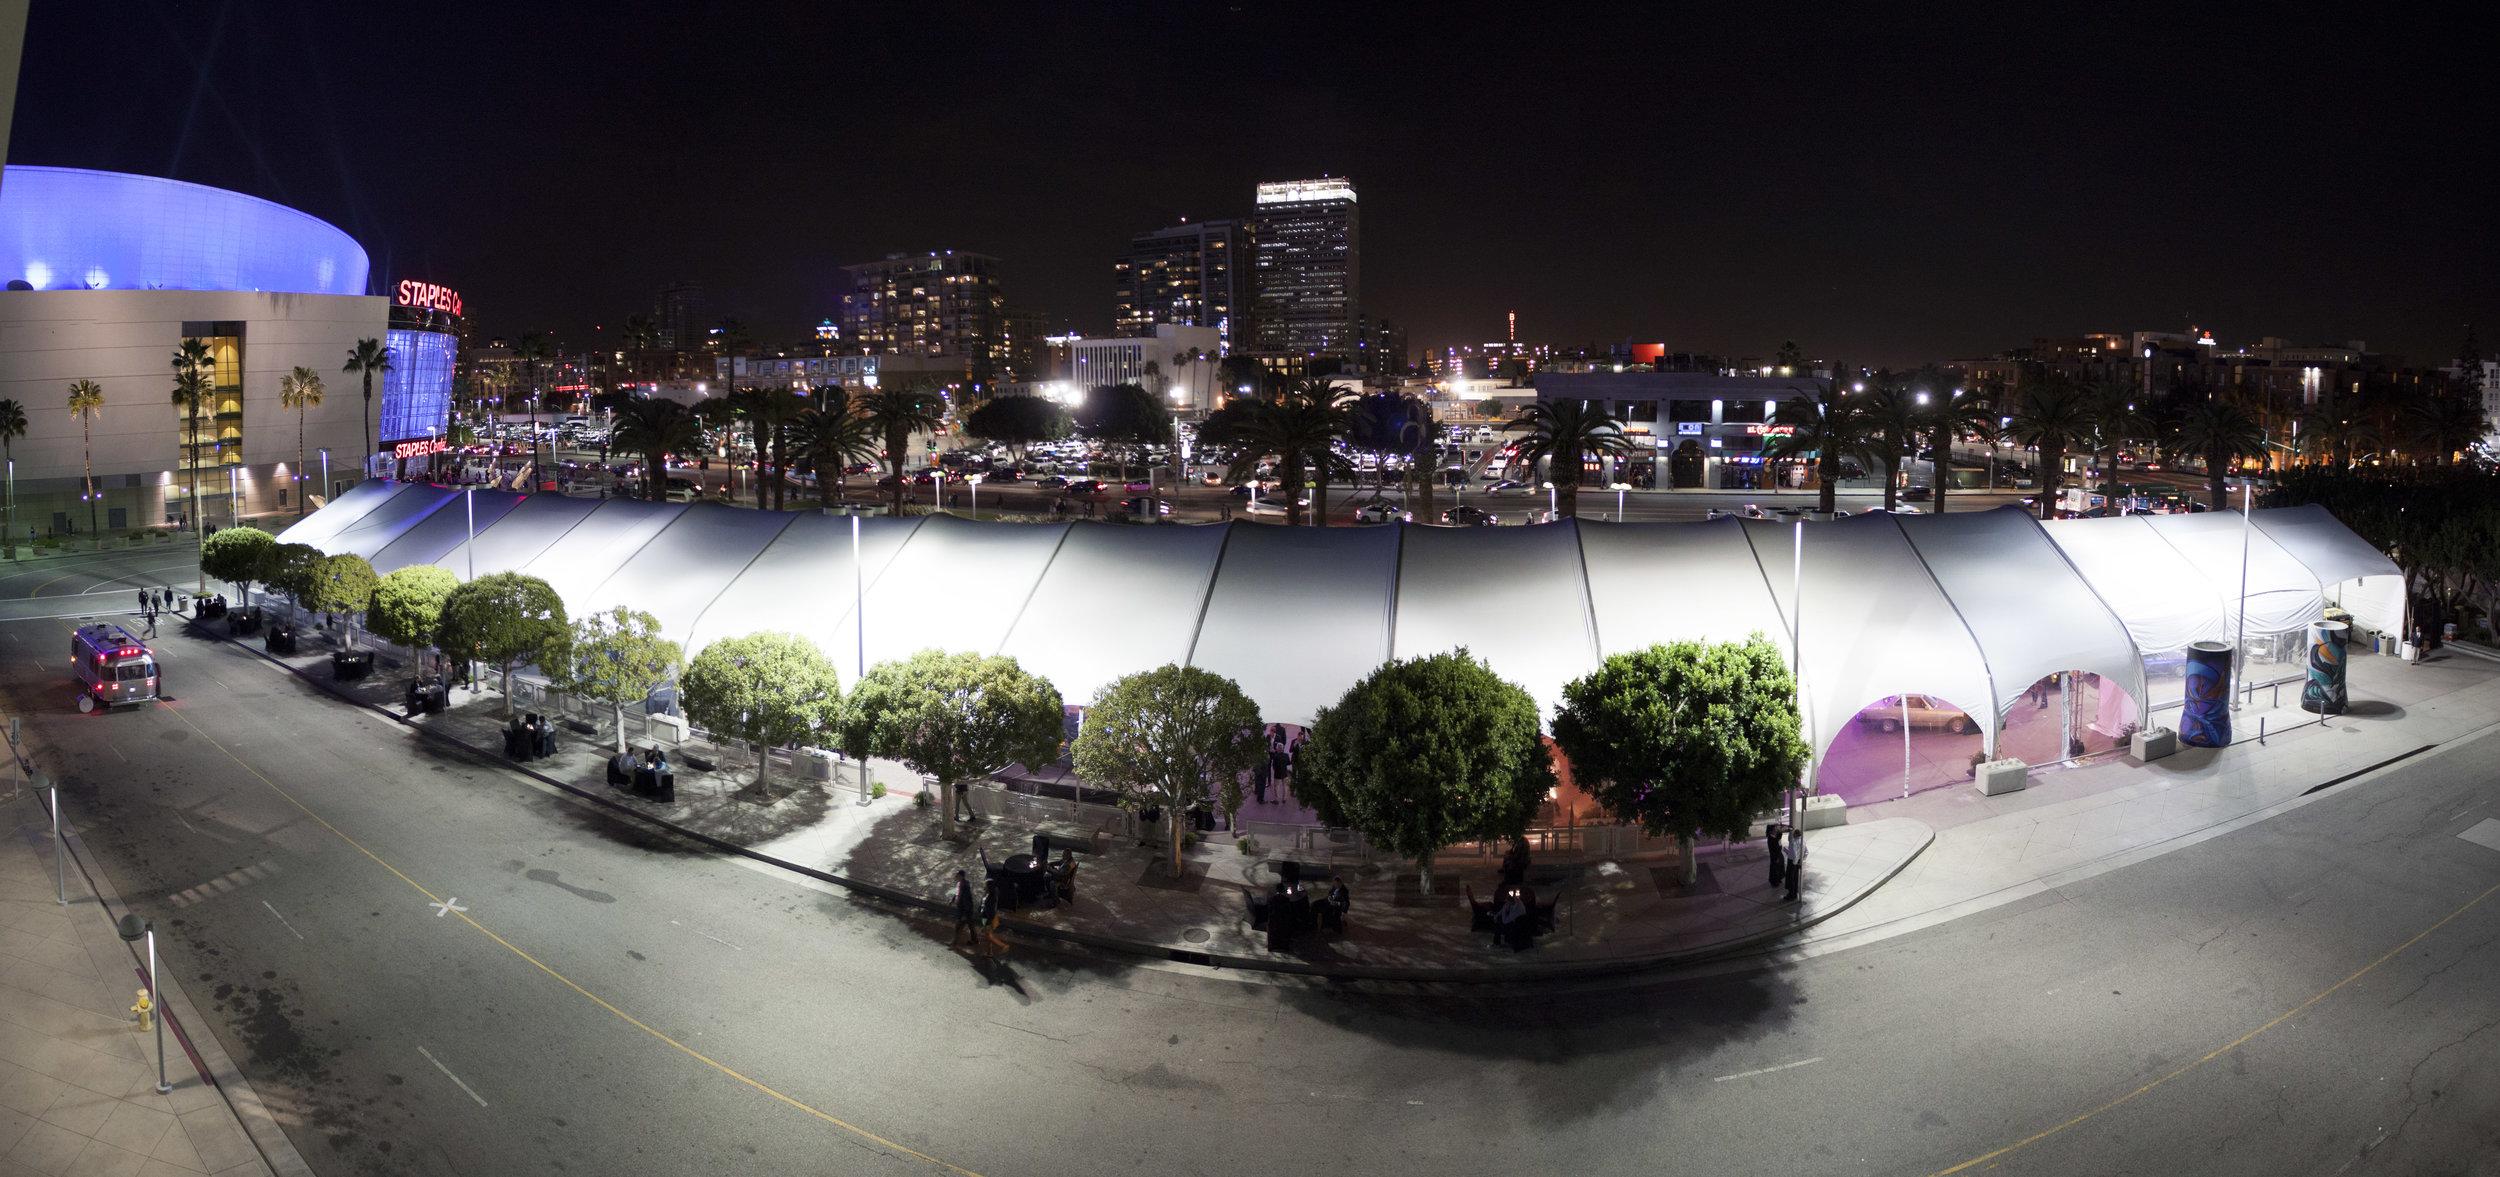 ChouraEvents_LA_Auto_Show_Tents_2.jpg